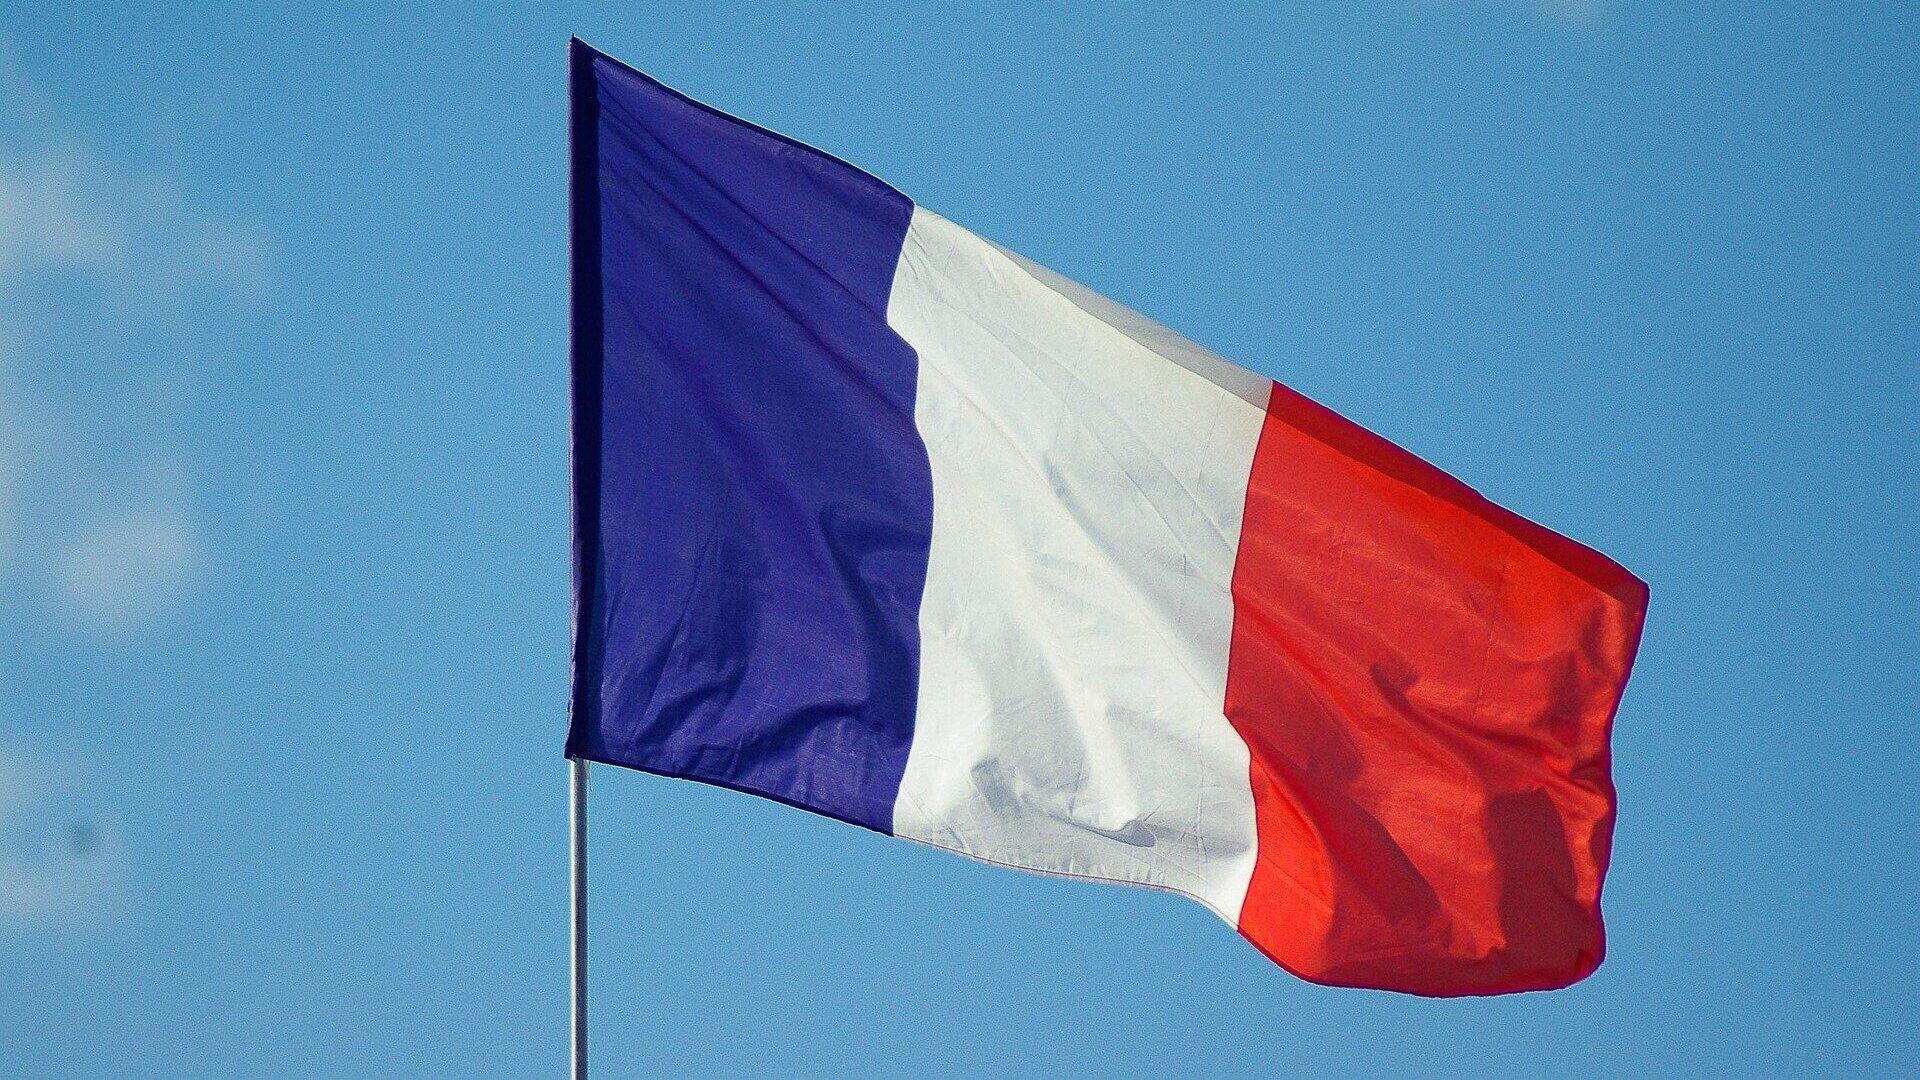 Frankreichs Flagge (Symbolbild) - SNA, 1920, 12.09.2021